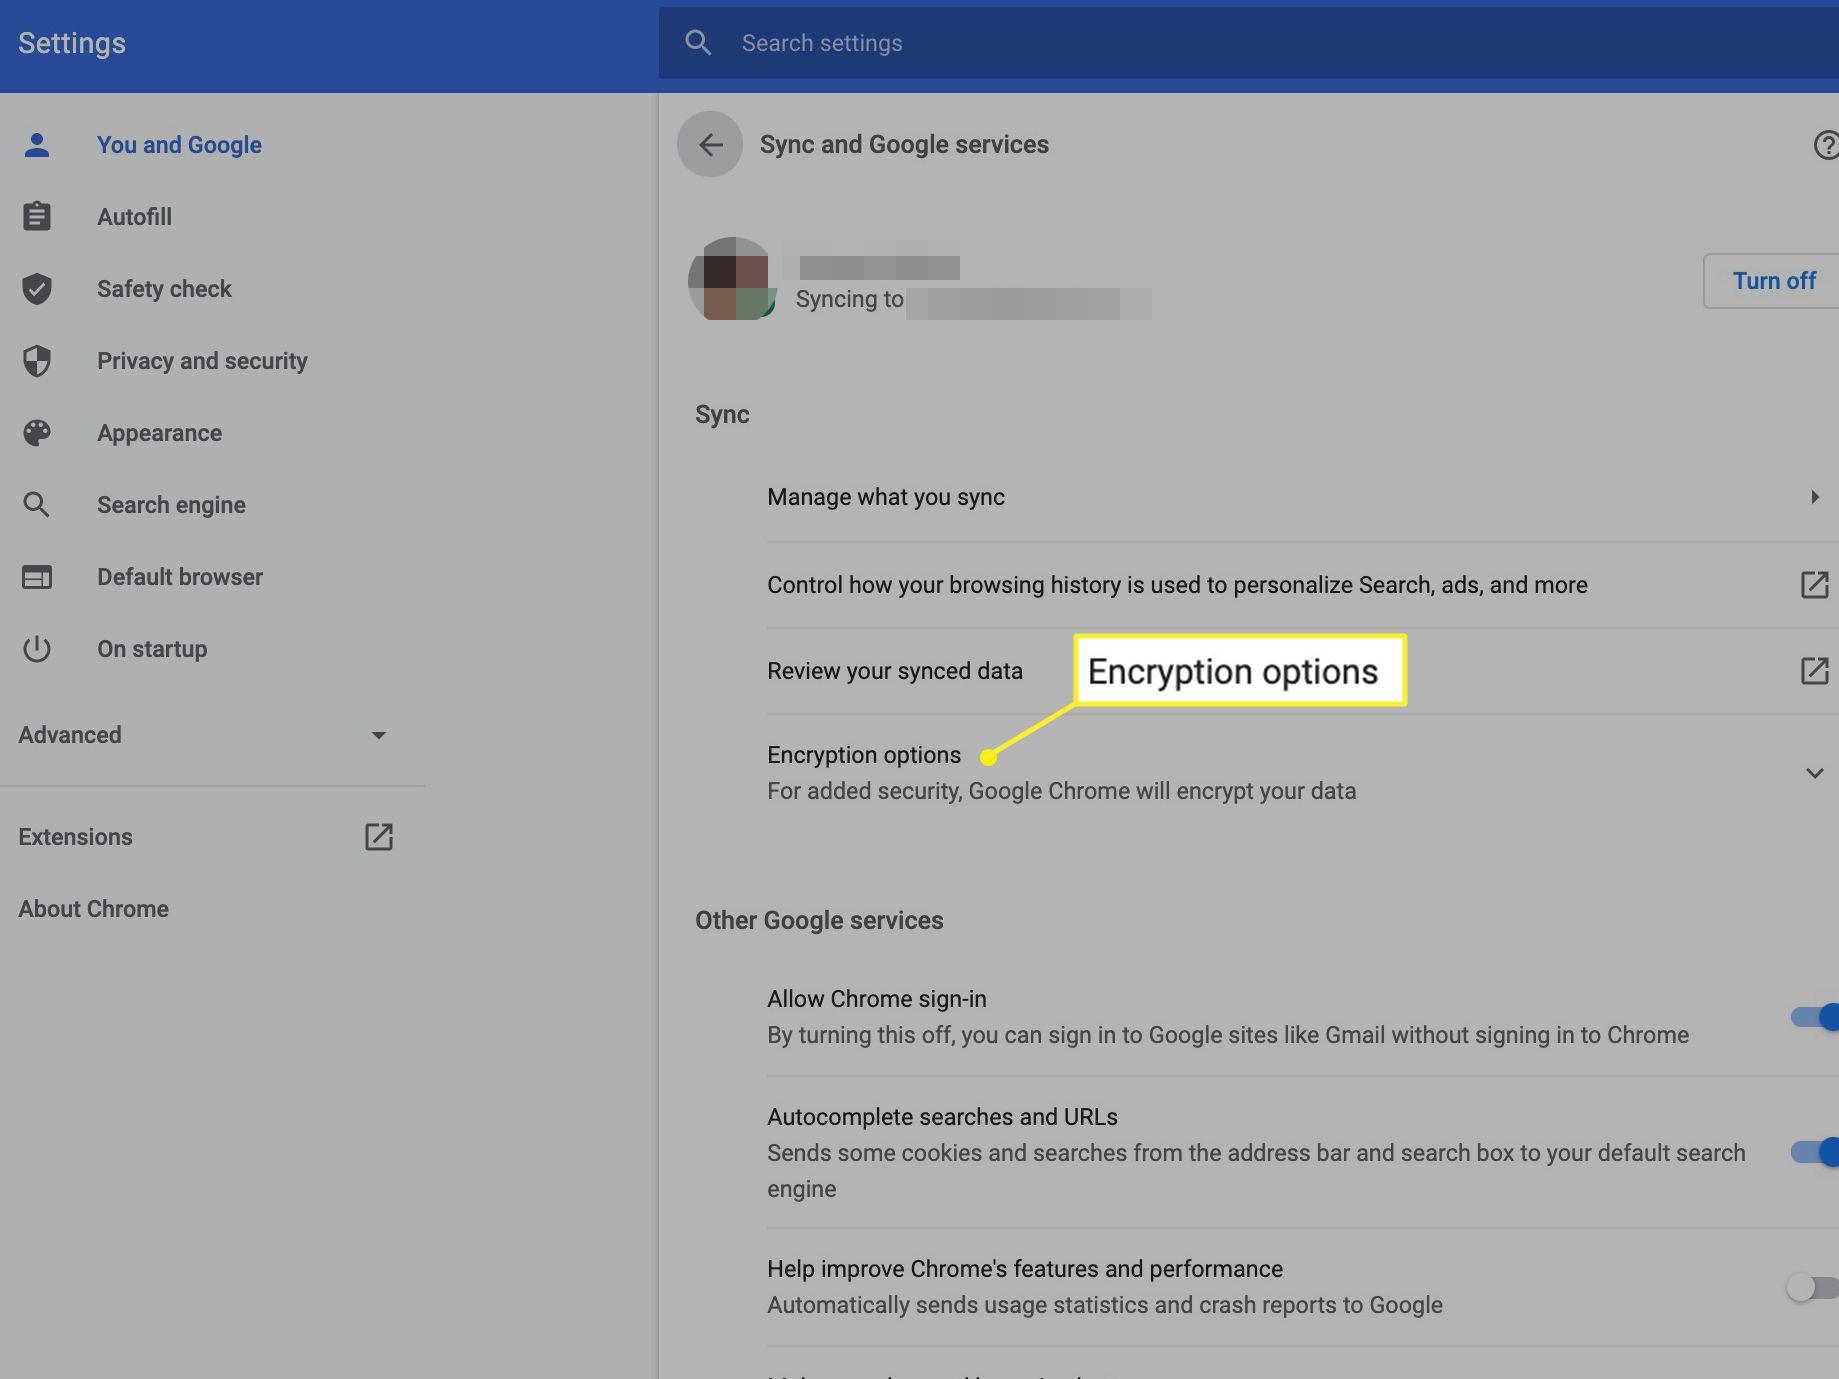 Encryption options